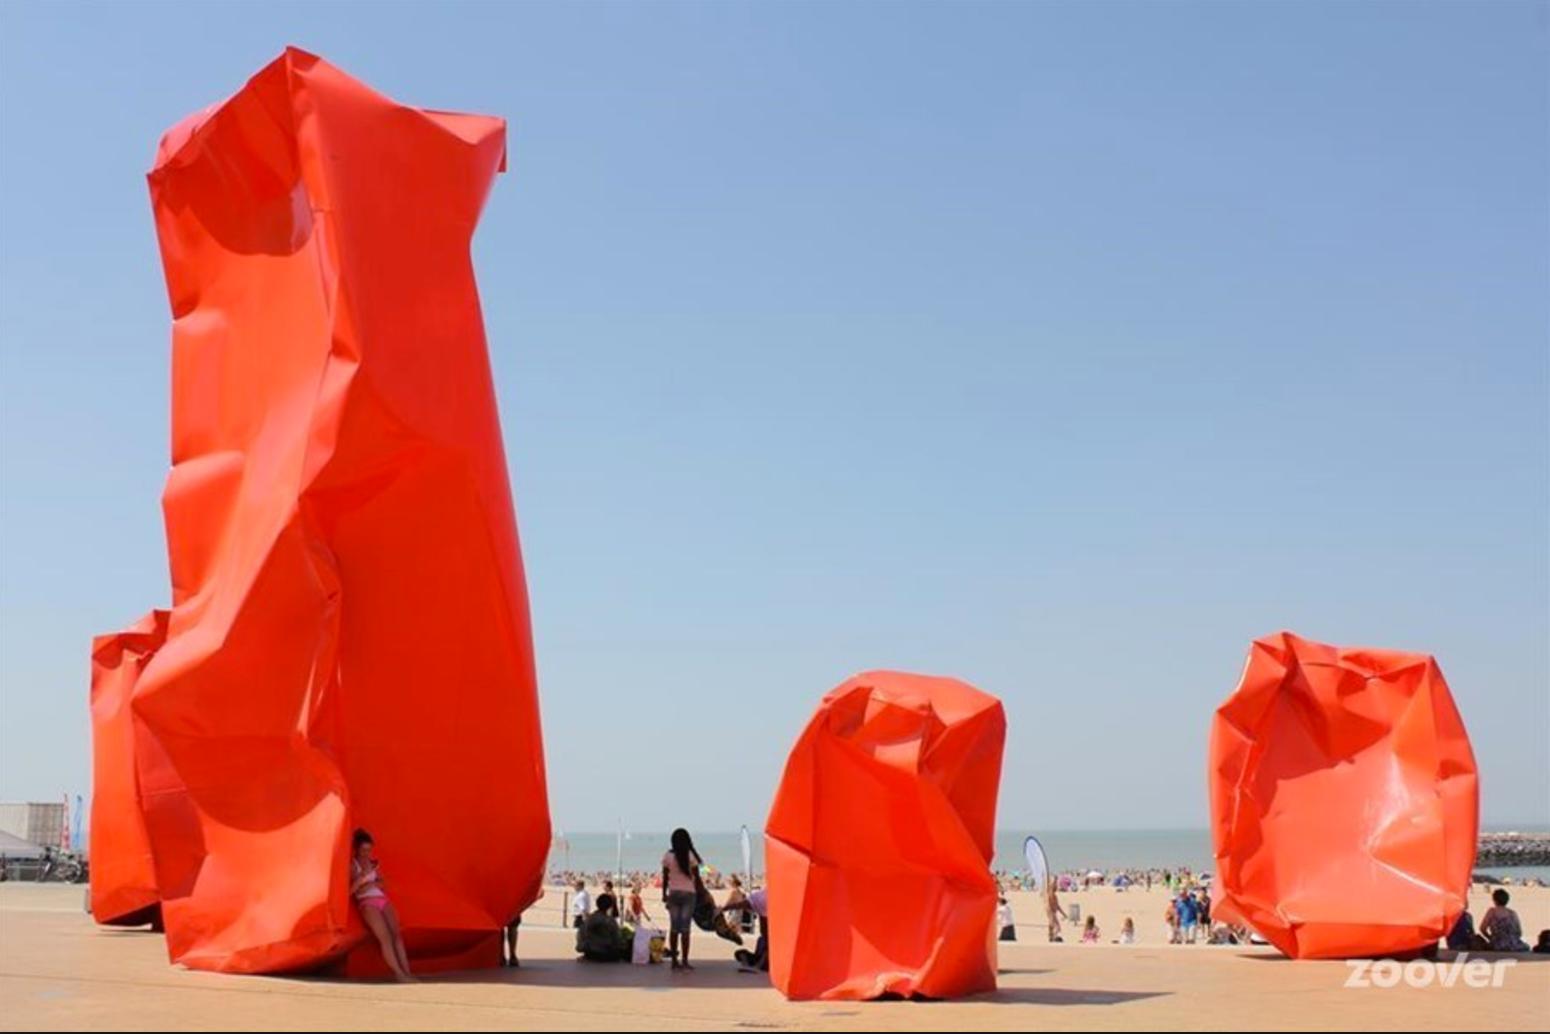 4. Oostende, Arne Quinze, Rock Strangers